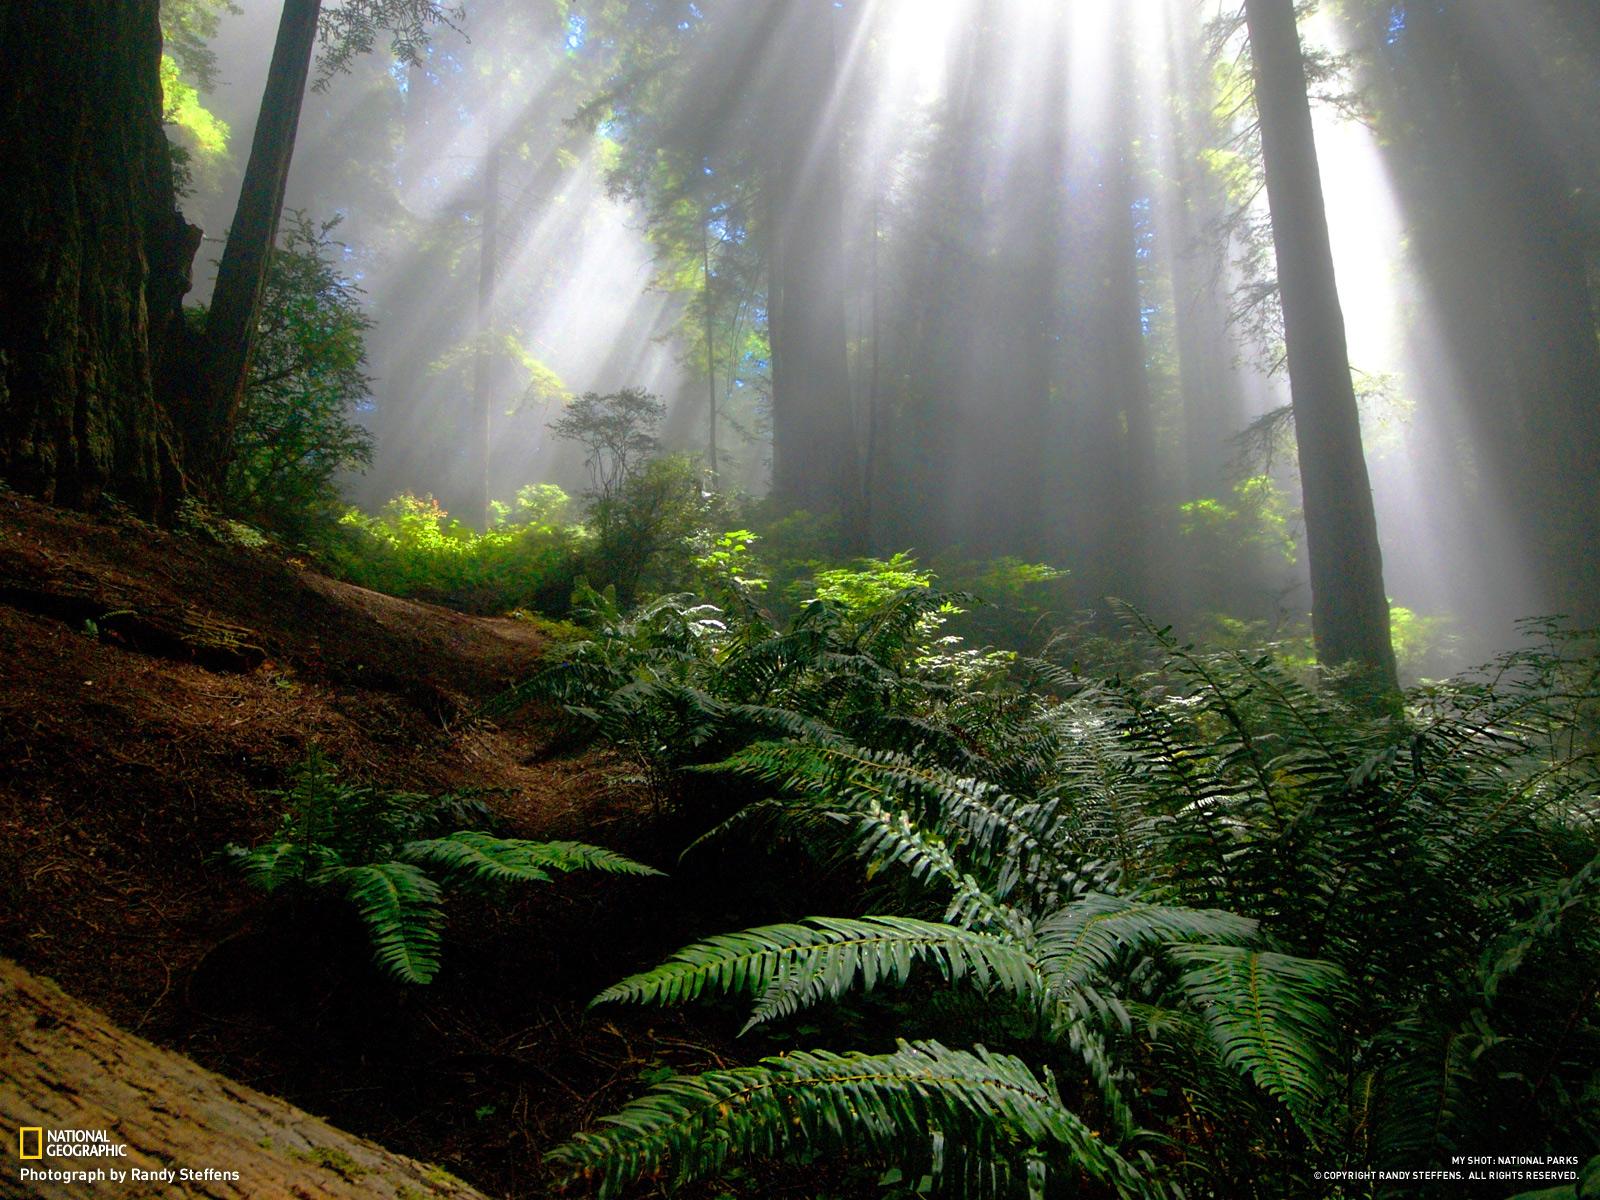 http://2.bp.blogspot.com/-ALmgidWXApc/TtpaFbq5FiI/AAAAAAAAAfs/szm88xOEXzc/s1600/41-national-parks-1600.jpg